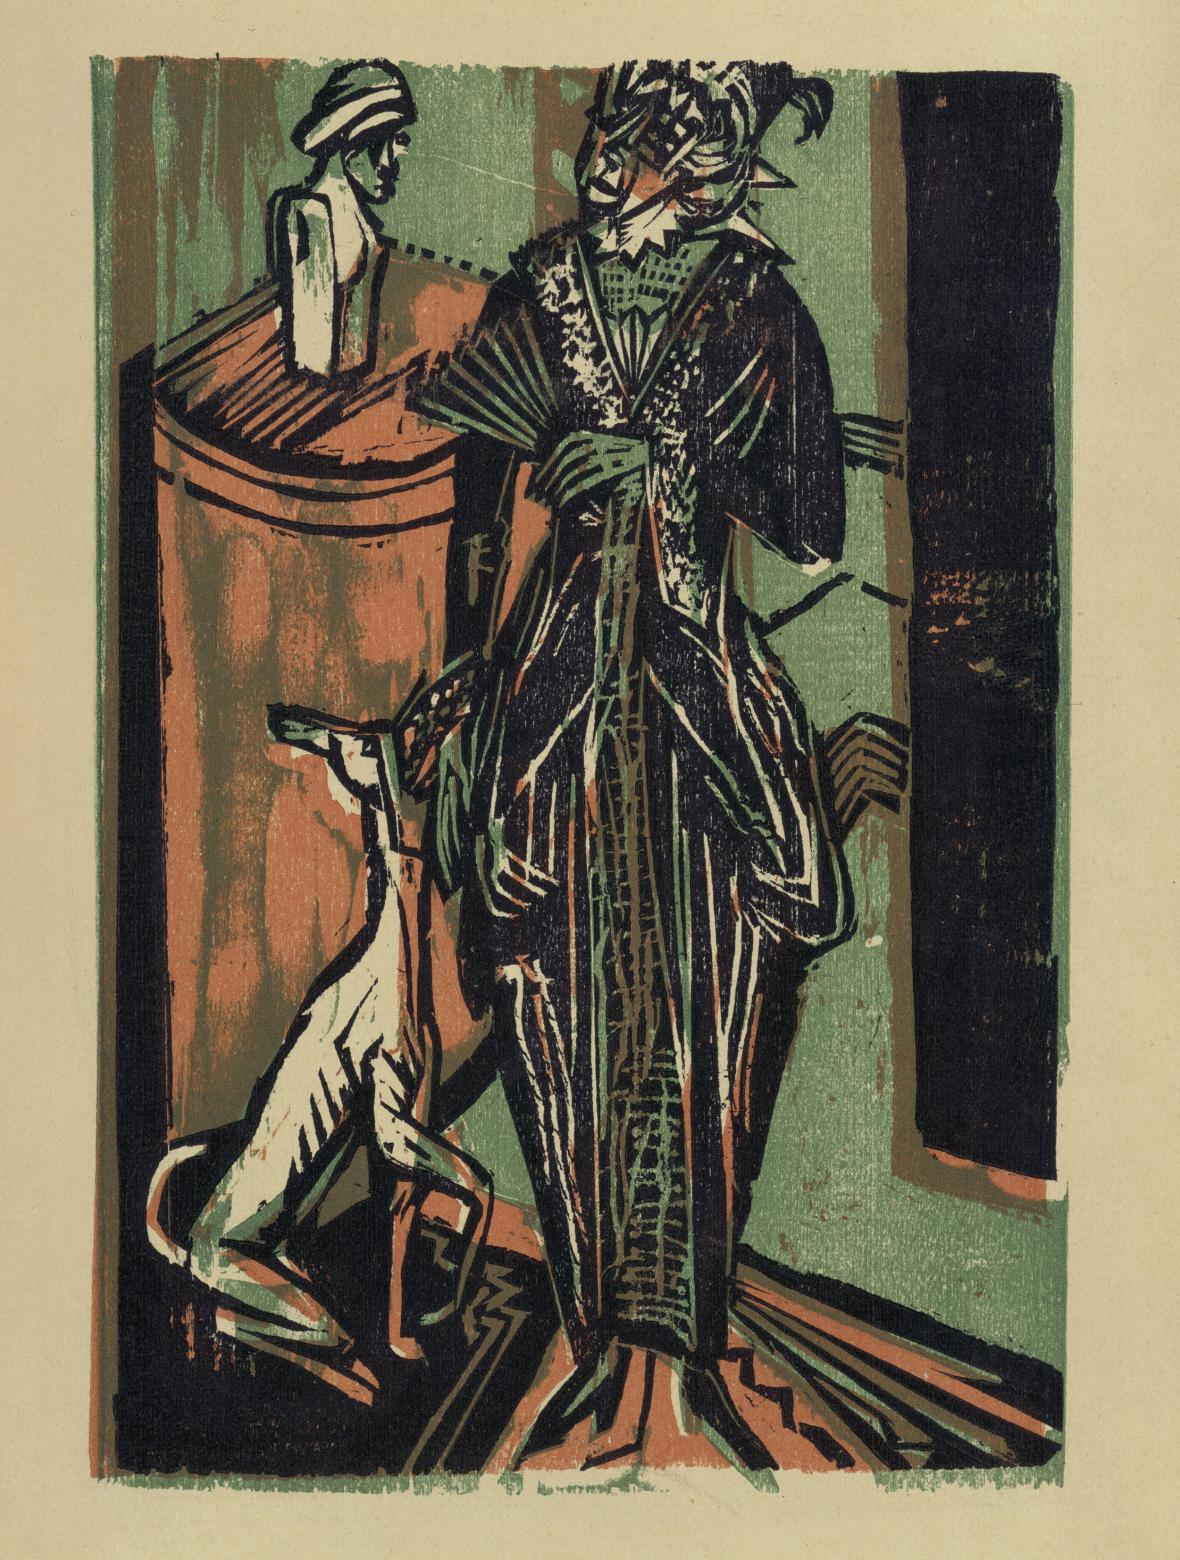 Ernst Ludwig Kirchner / Dáma se psem, 1916